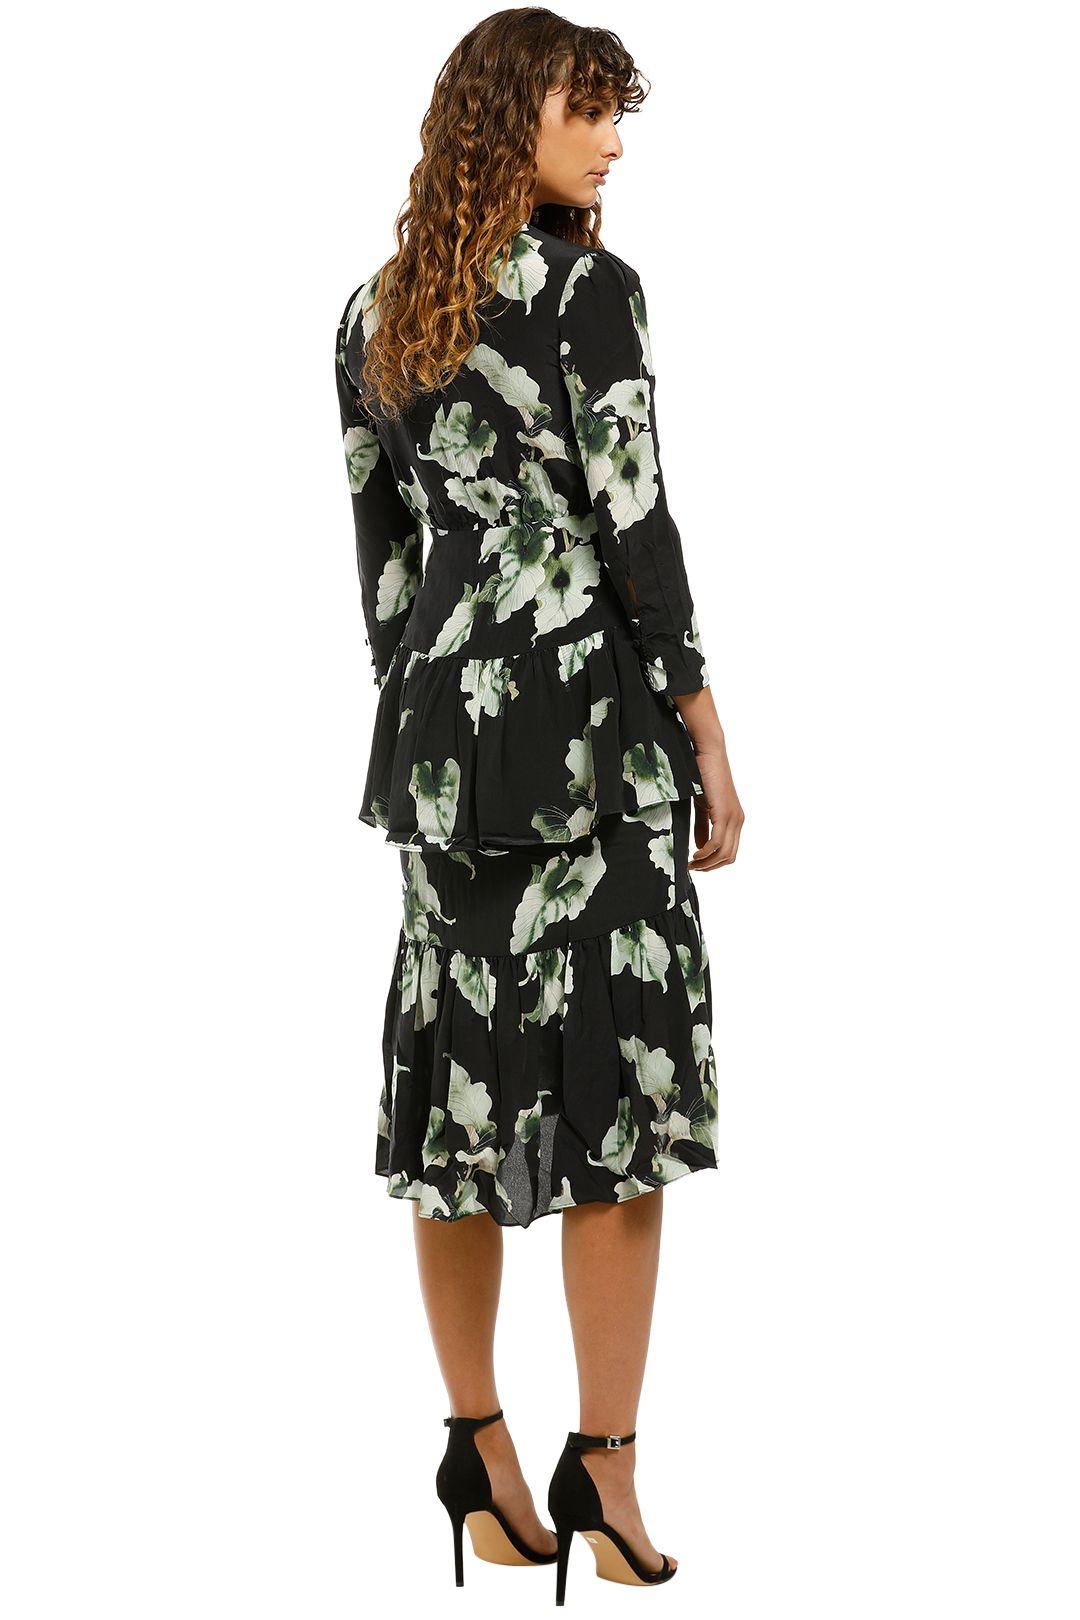 Husk-Amazon-Dress-Leaf-Print-Back